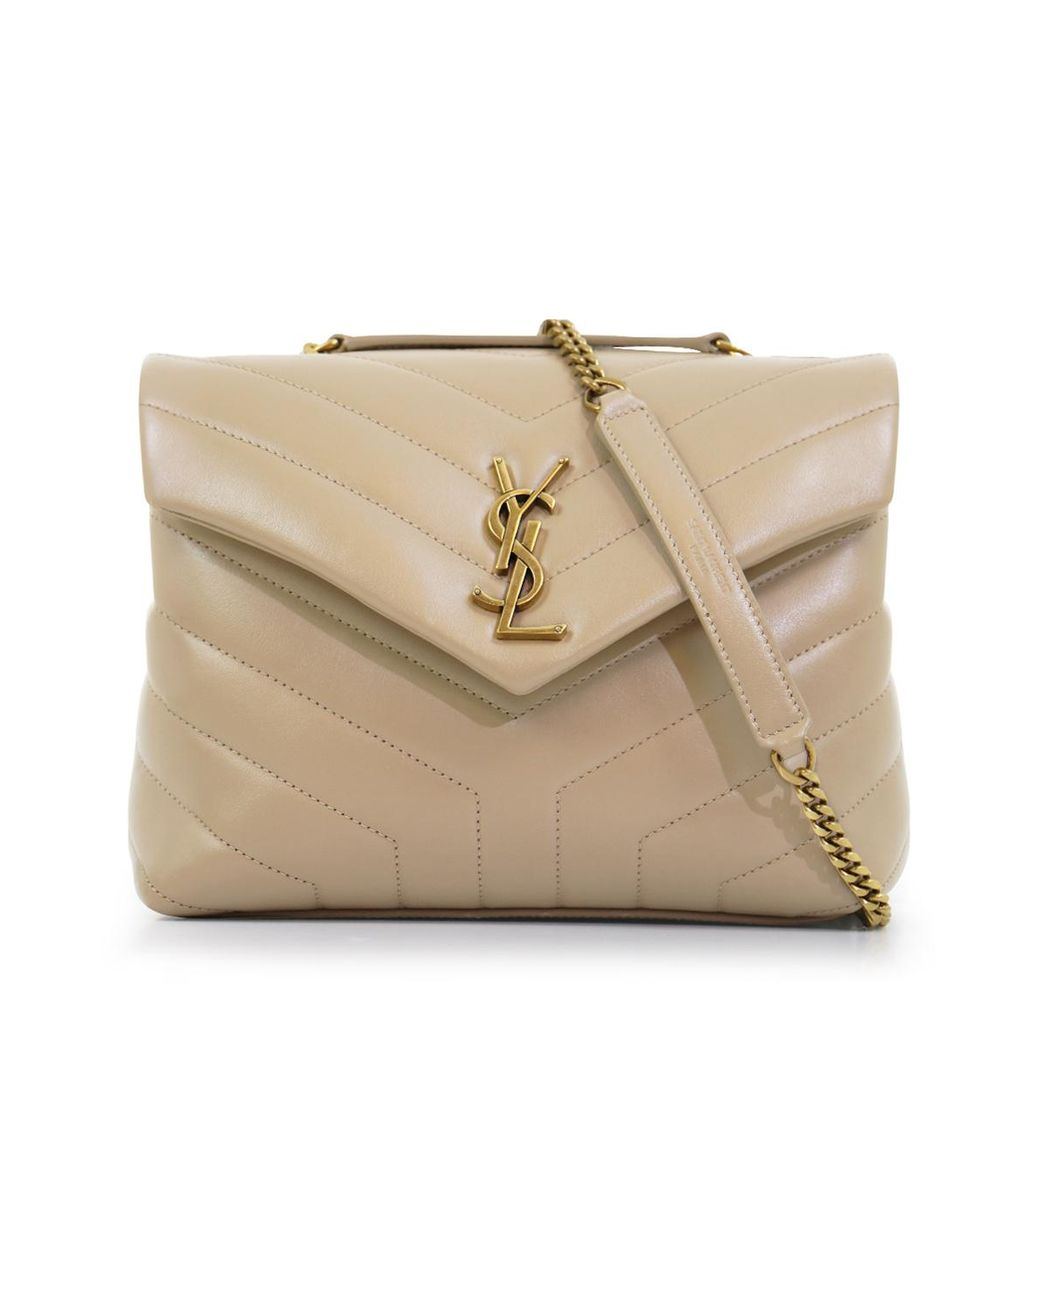 8ec73158 Women's Natural Loulou Small Flap Bag Poudre